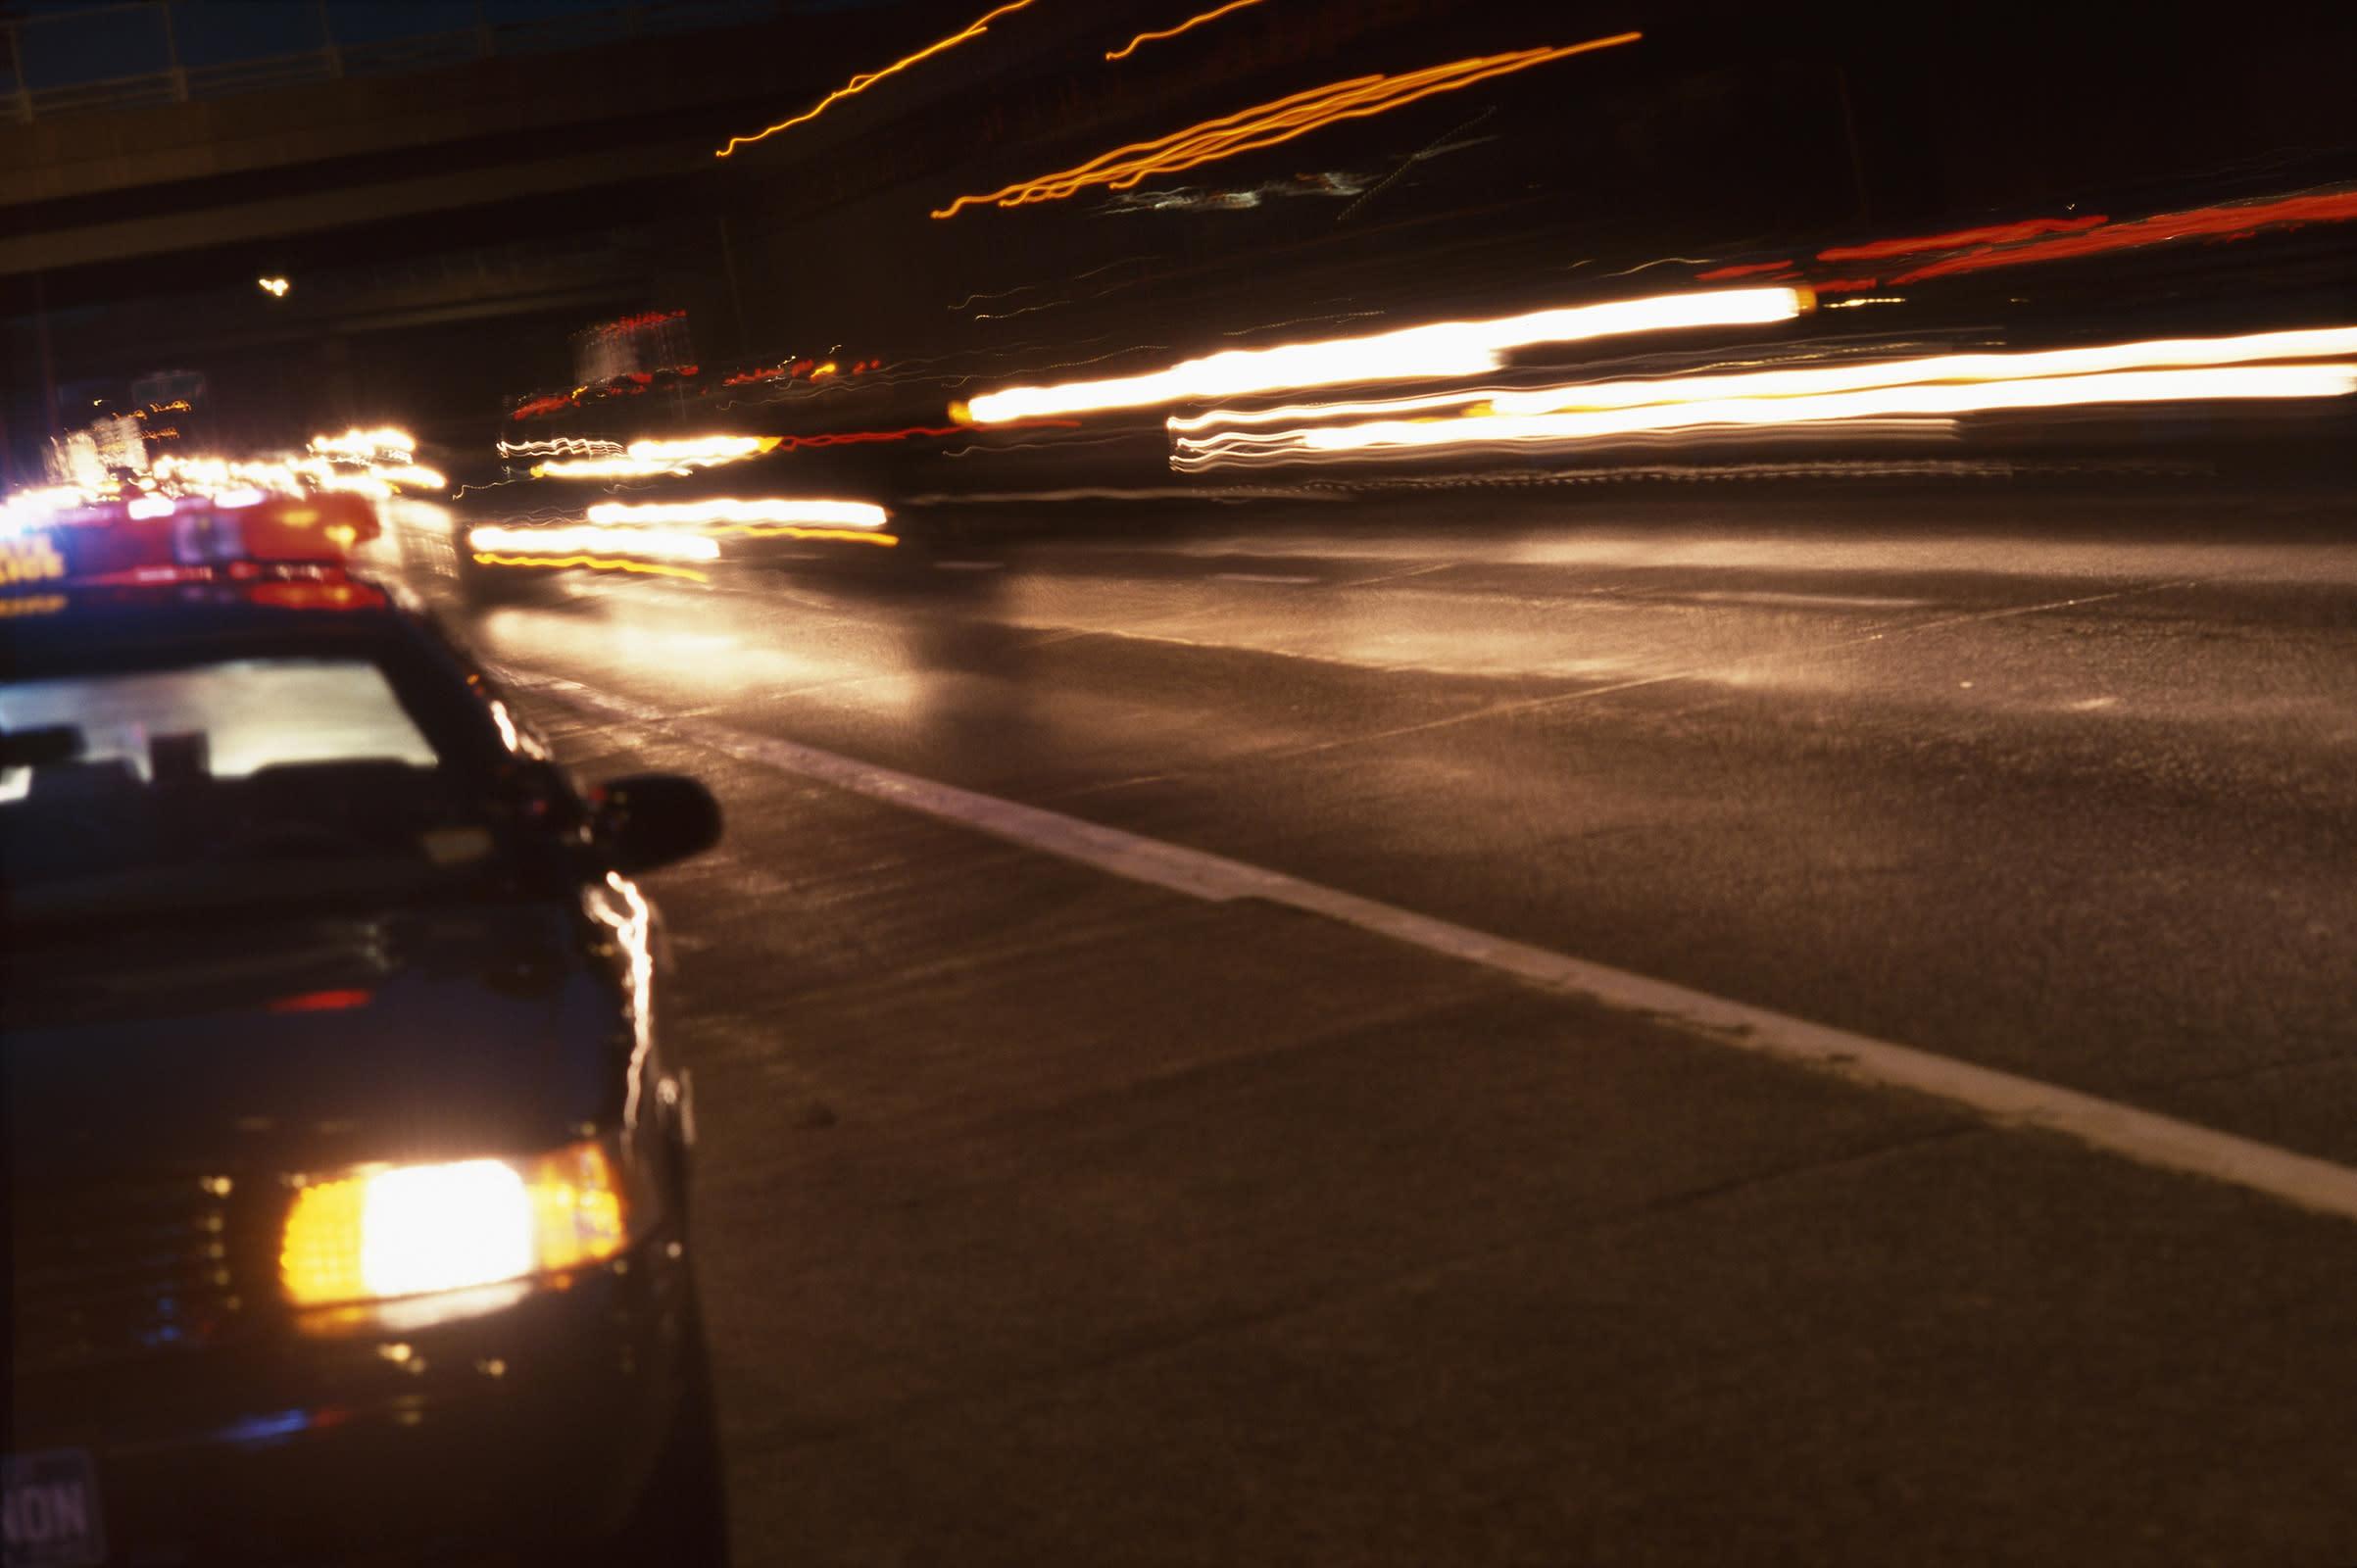 Drunken Man Rides Horse Onto California Freeway, Police Say